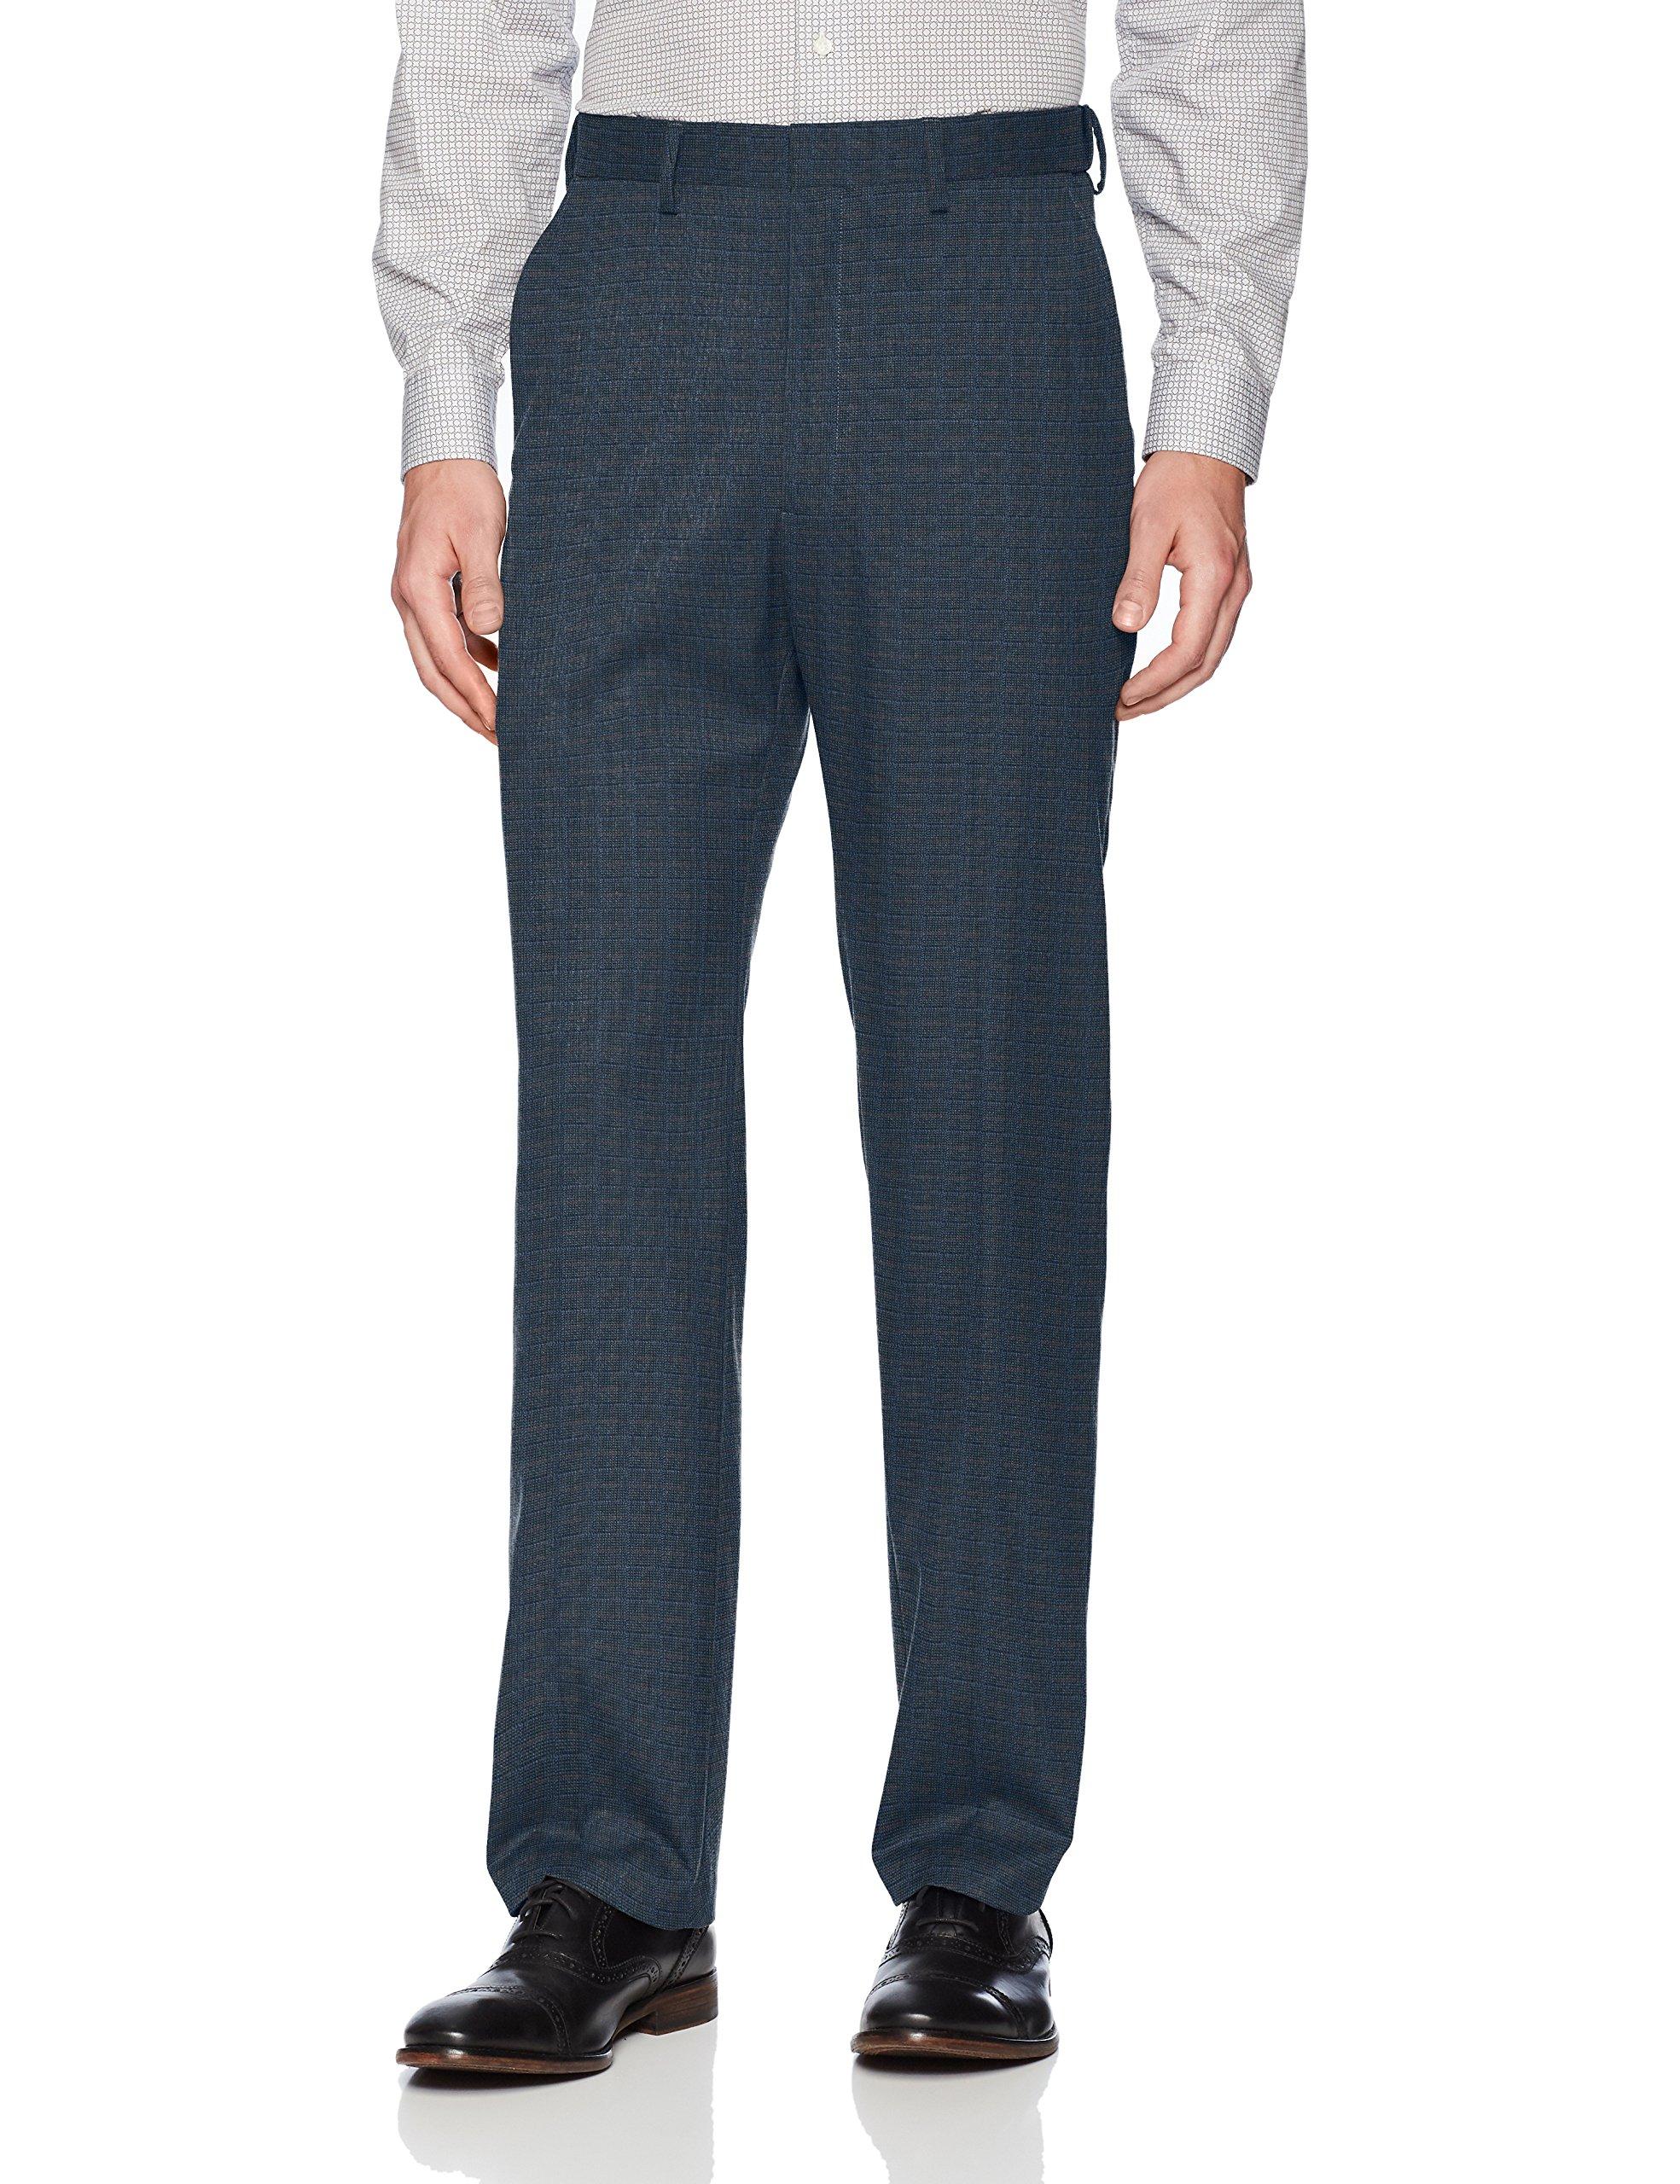 Haggar Men's J.m Premium Deco Classic Fit Suit Separate Pant, Navy, 40Wx30L